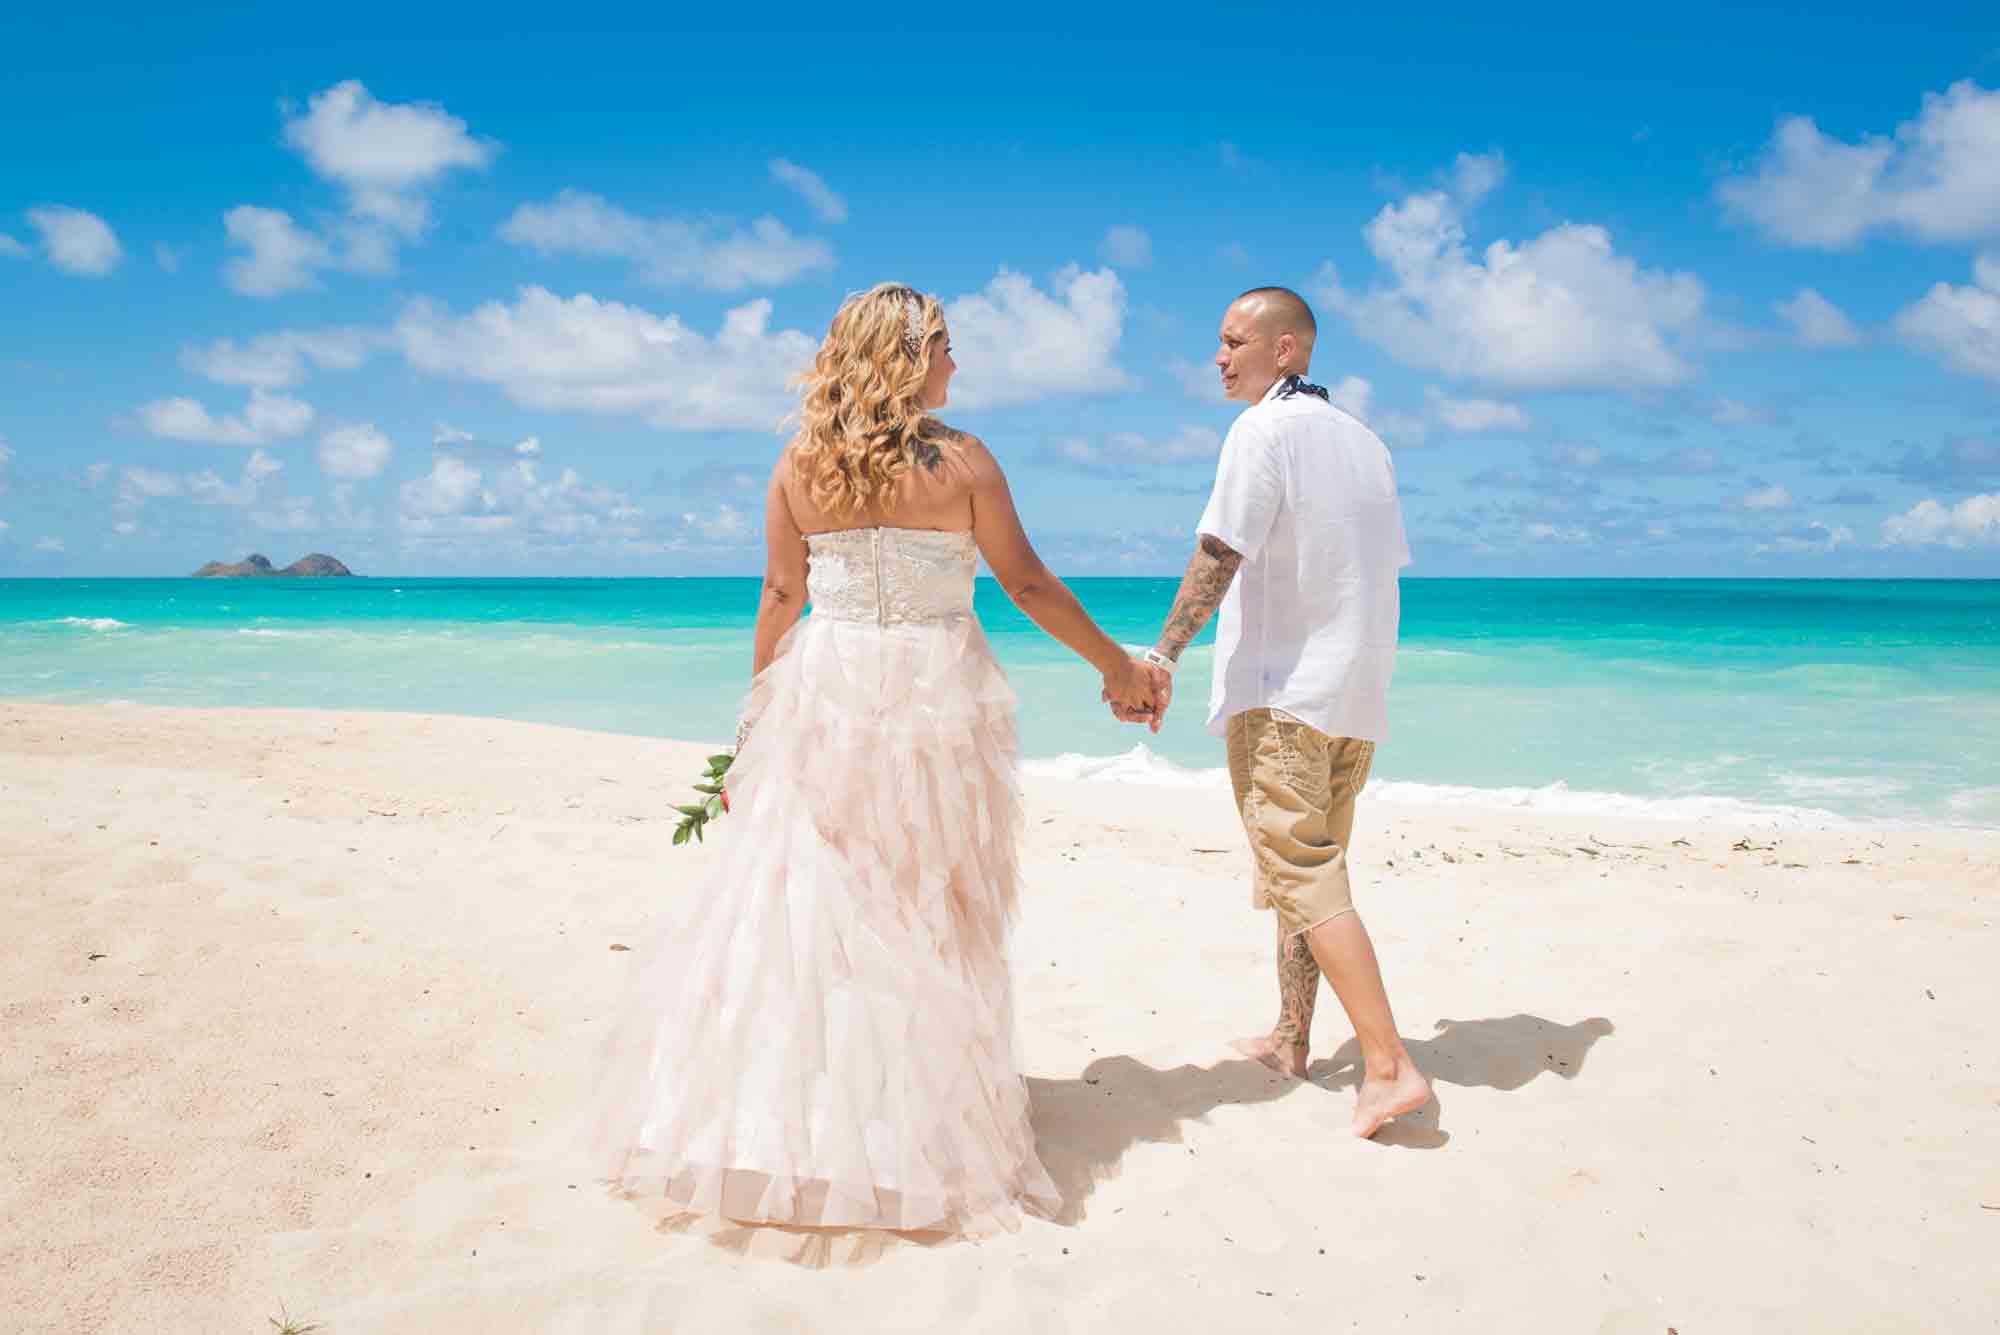 Newlyweds walking on a beach in Hawaii